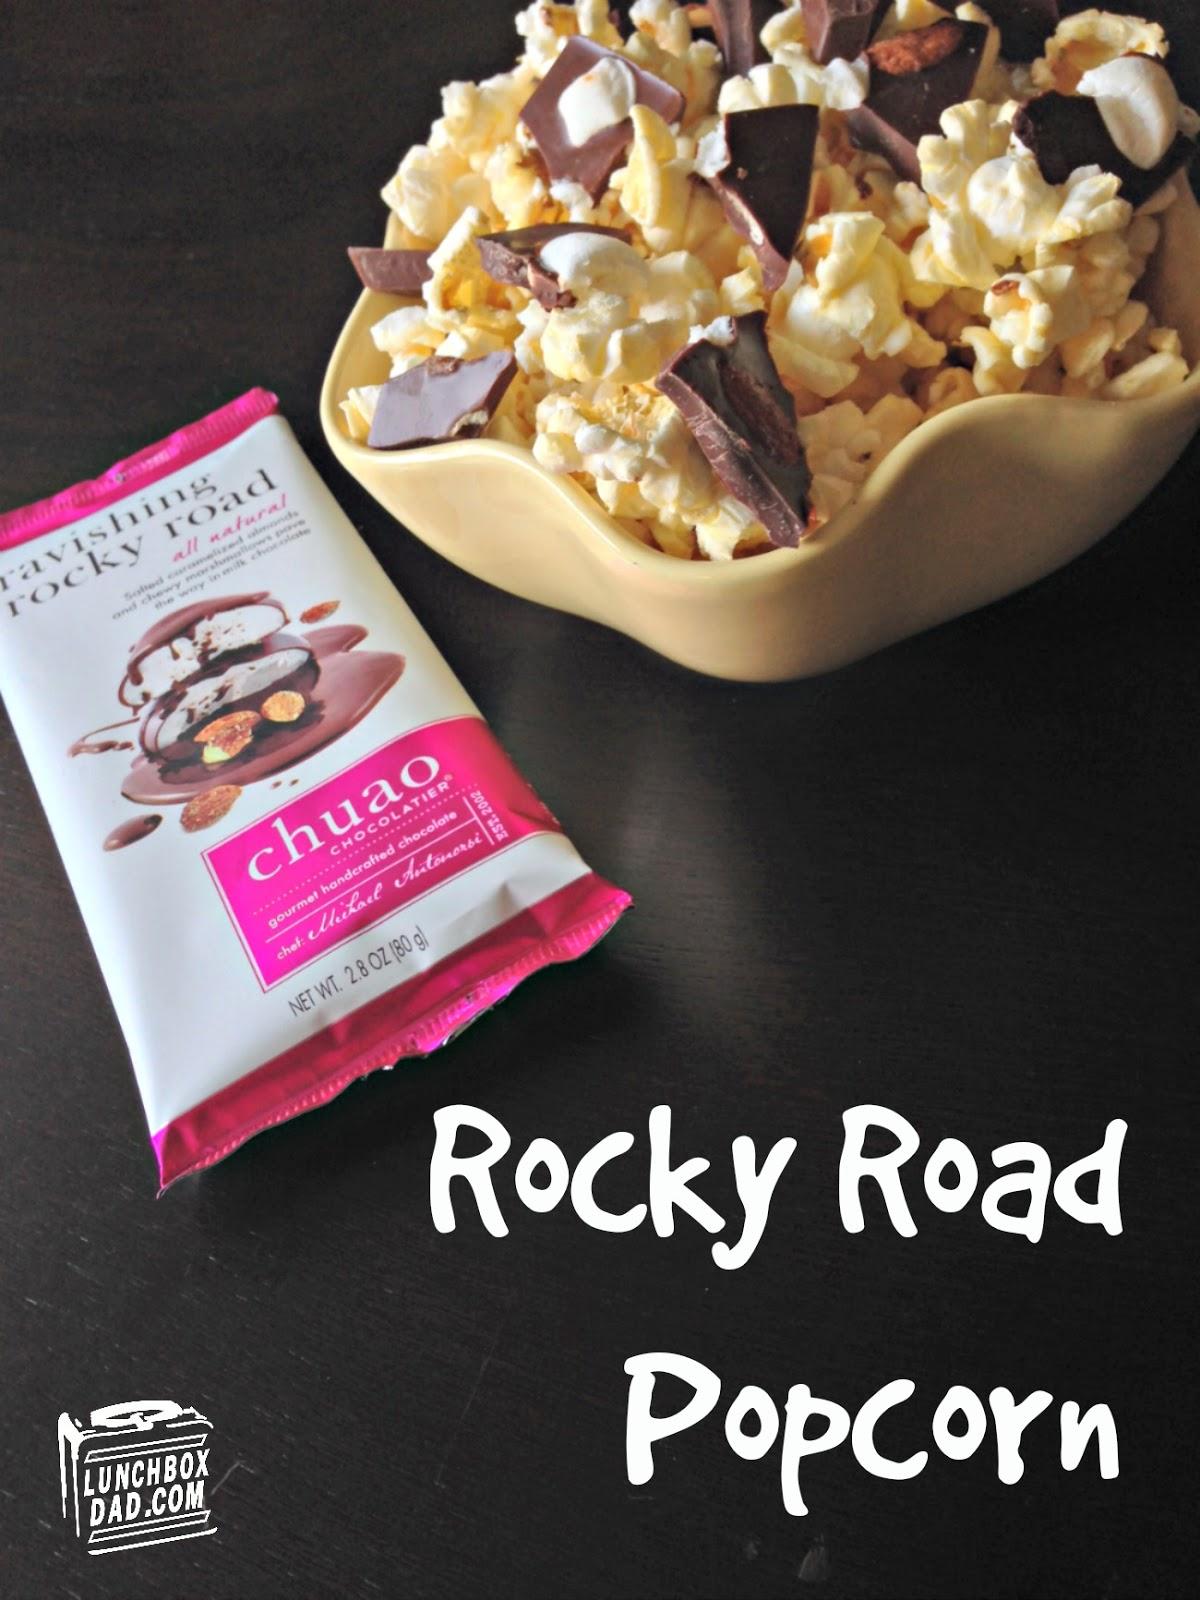 Rocky Road Popcorn with Chuao Chocolate